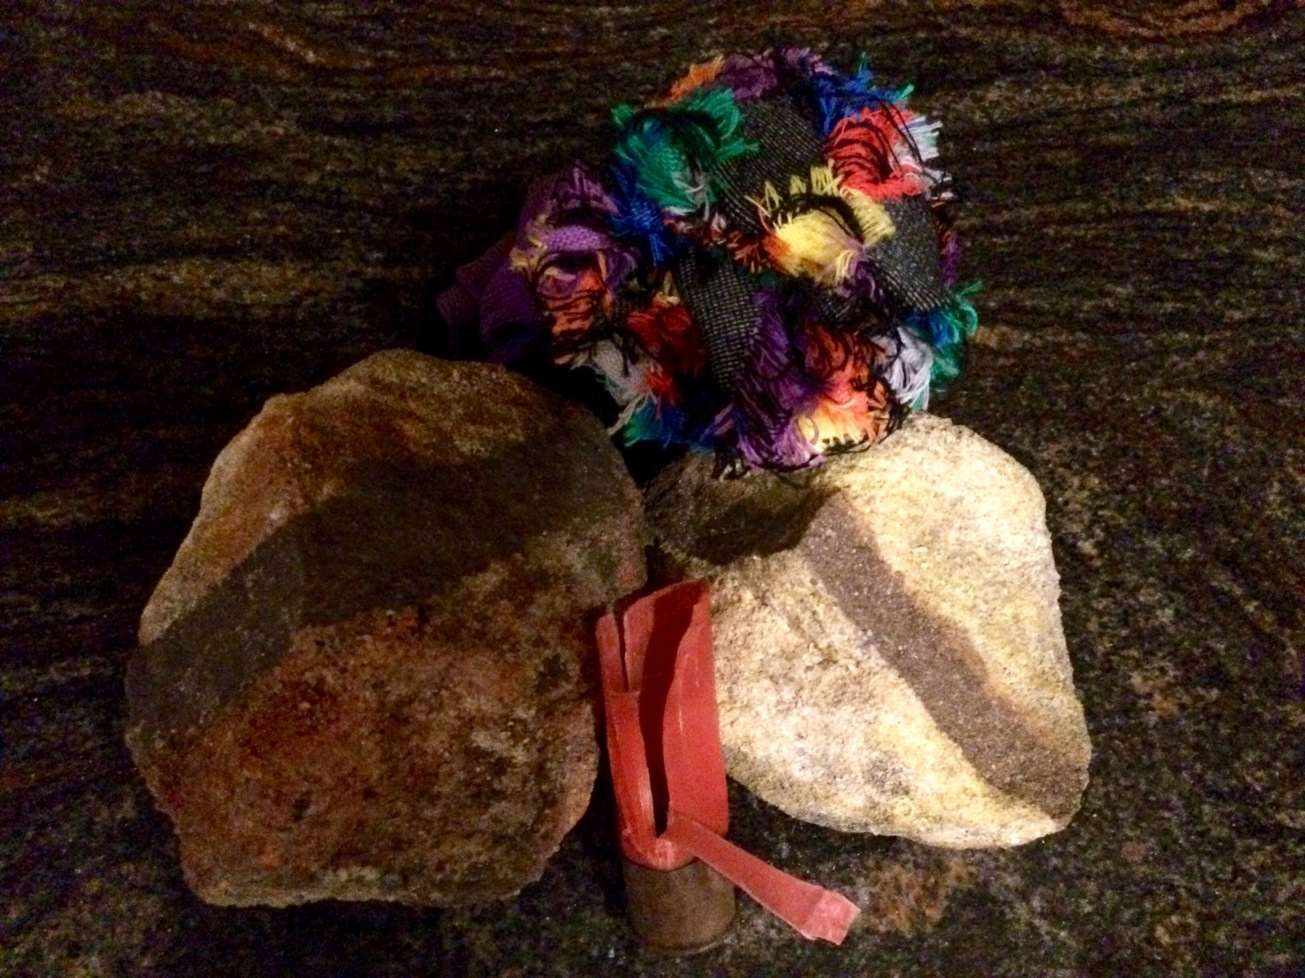 Rocks and socks